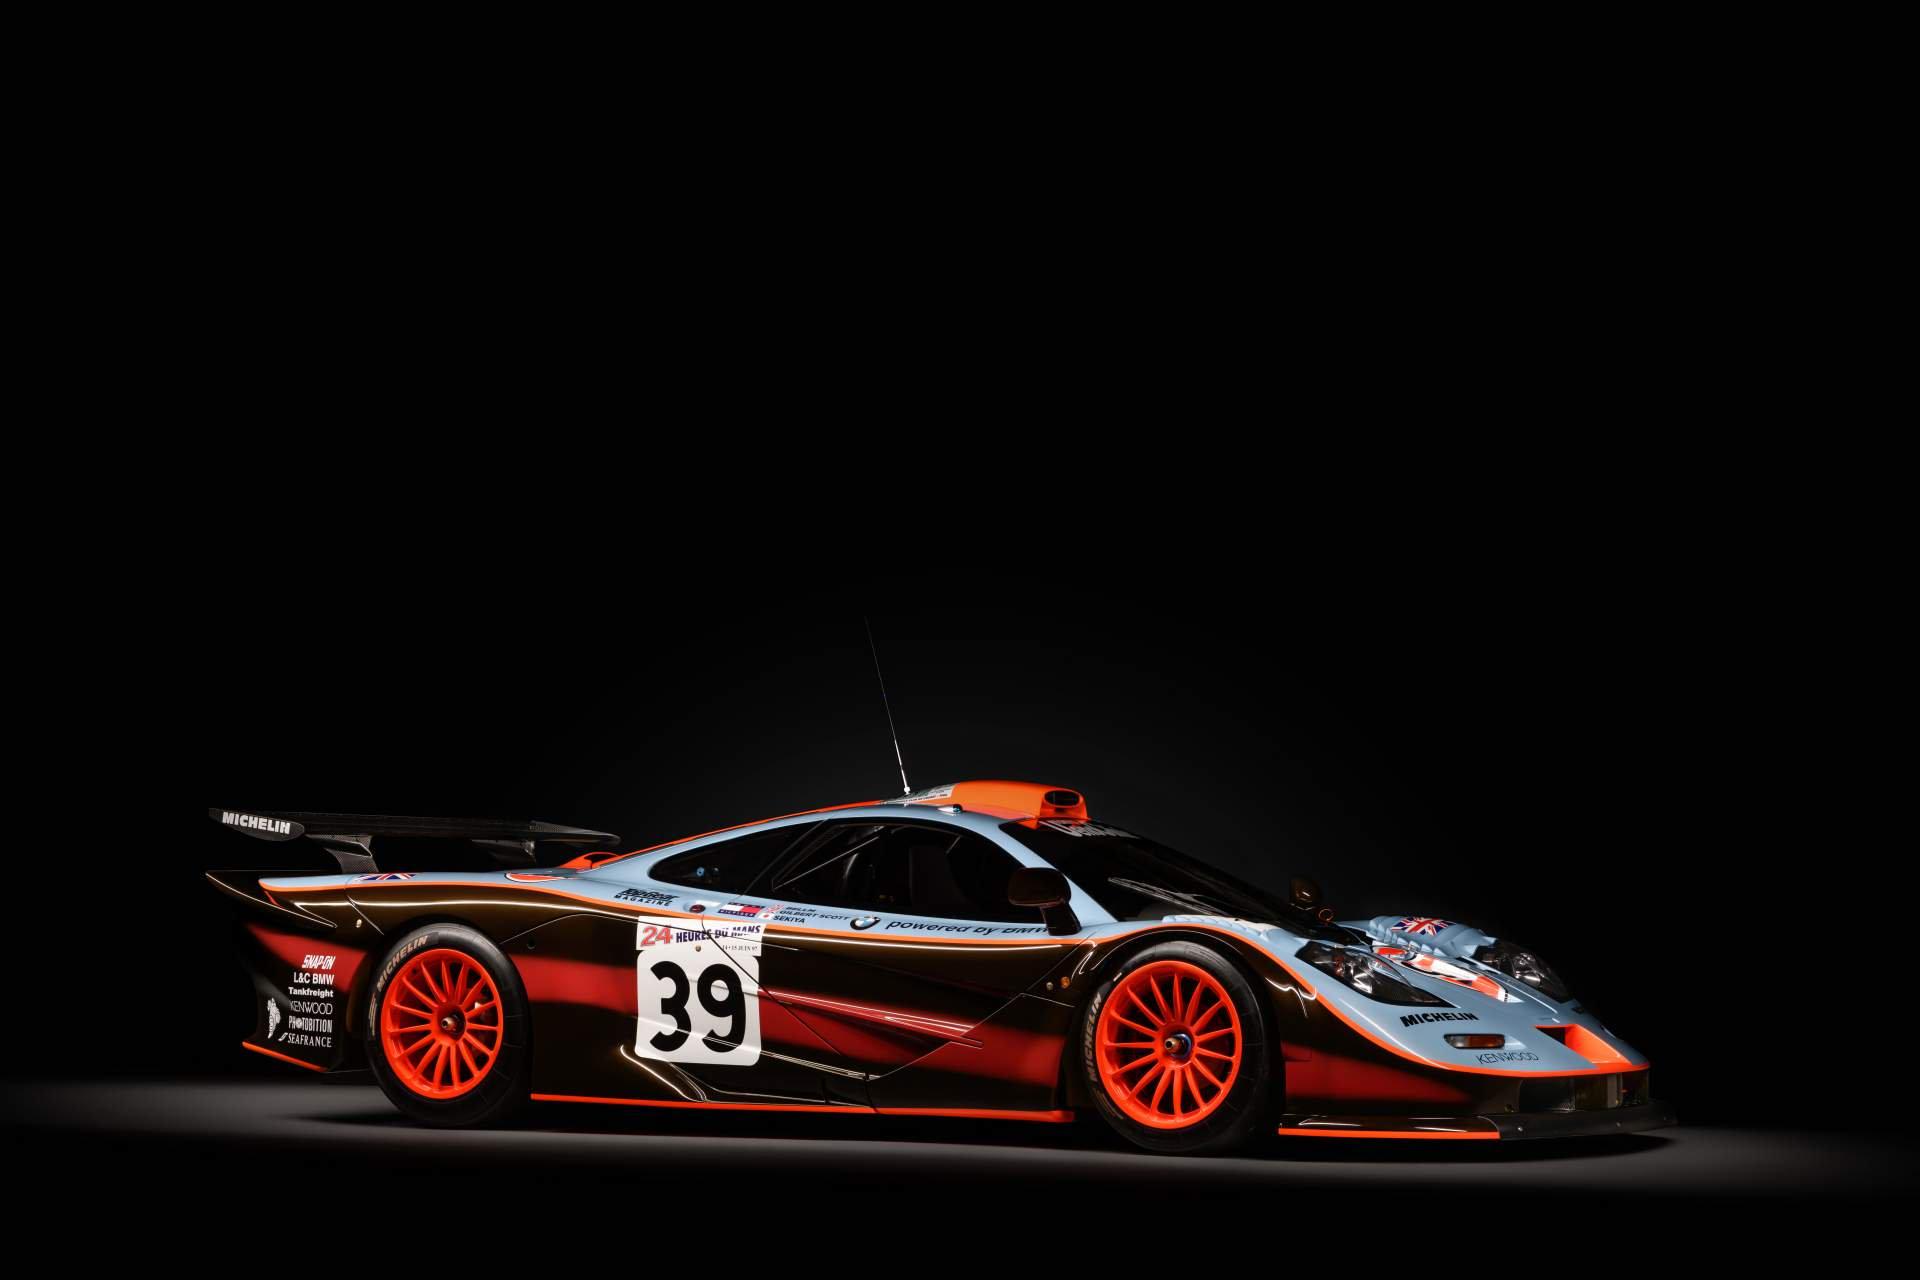 McLaren F1 GTR Longtail 25R restored by MSO (4)